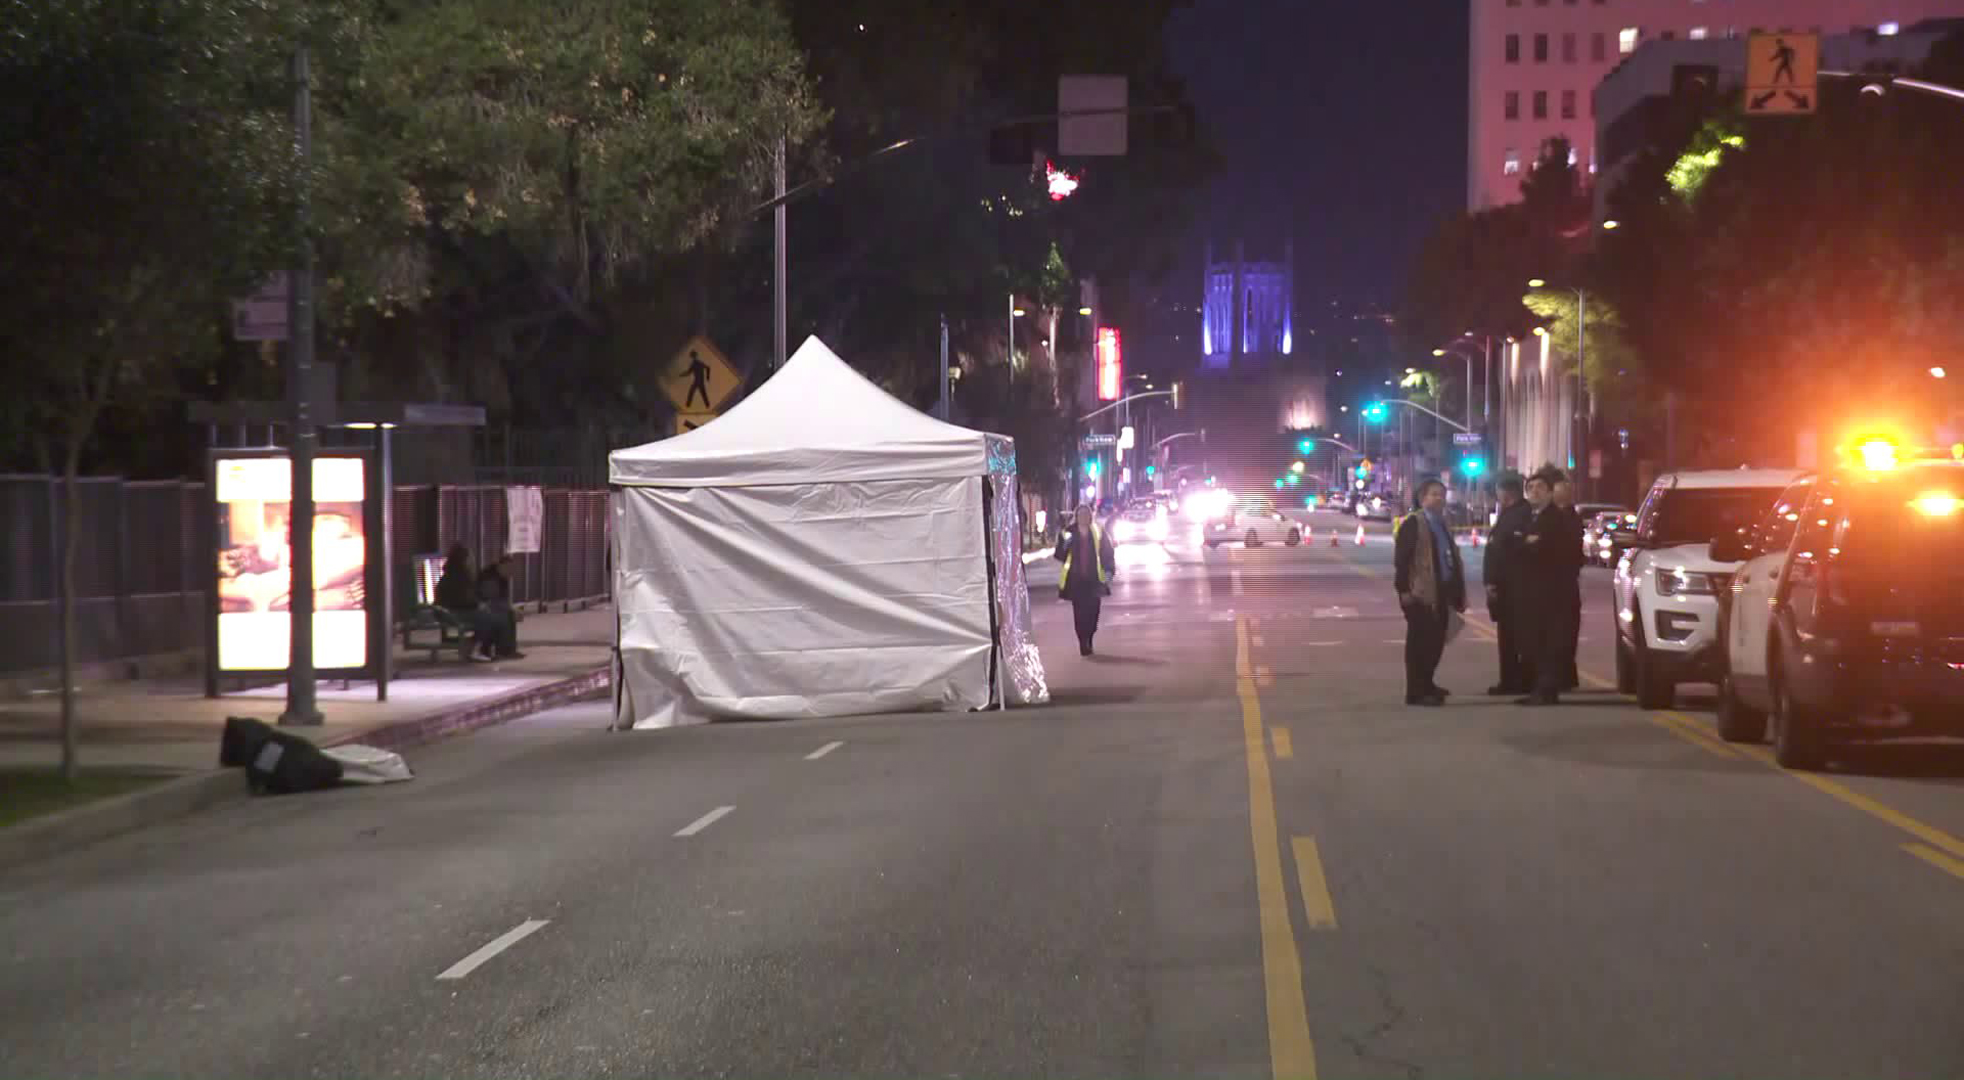 LAPD officials investigate the scene of a fatal crash in the Westlake neighborhood on Jan. 23, 2019. (Credit: KTLA)